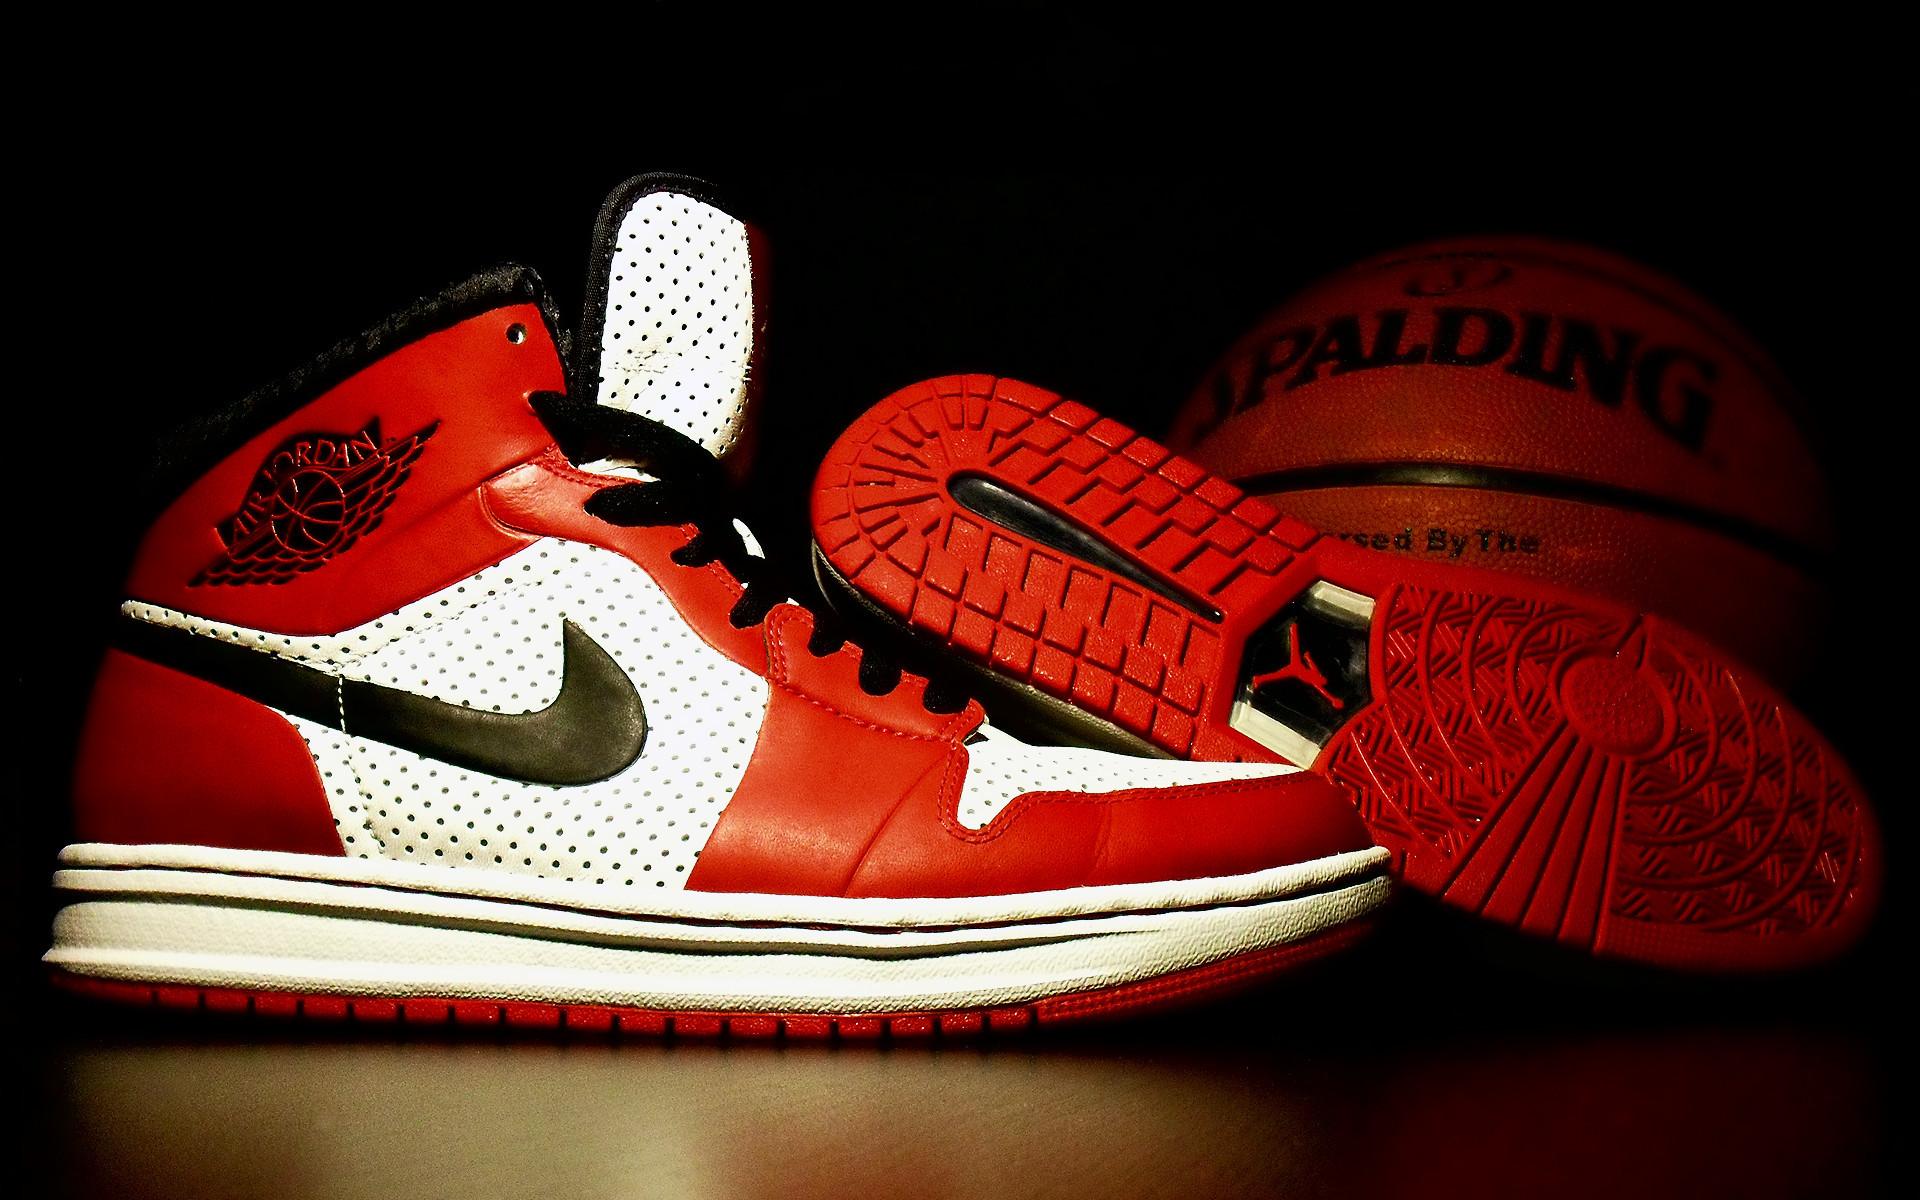 Res: 1920x1200, 1920x1080 ... sneaker dude vol 3 air jordan 3 retro 2006 fire red 2013 fire  red 2011 stealth